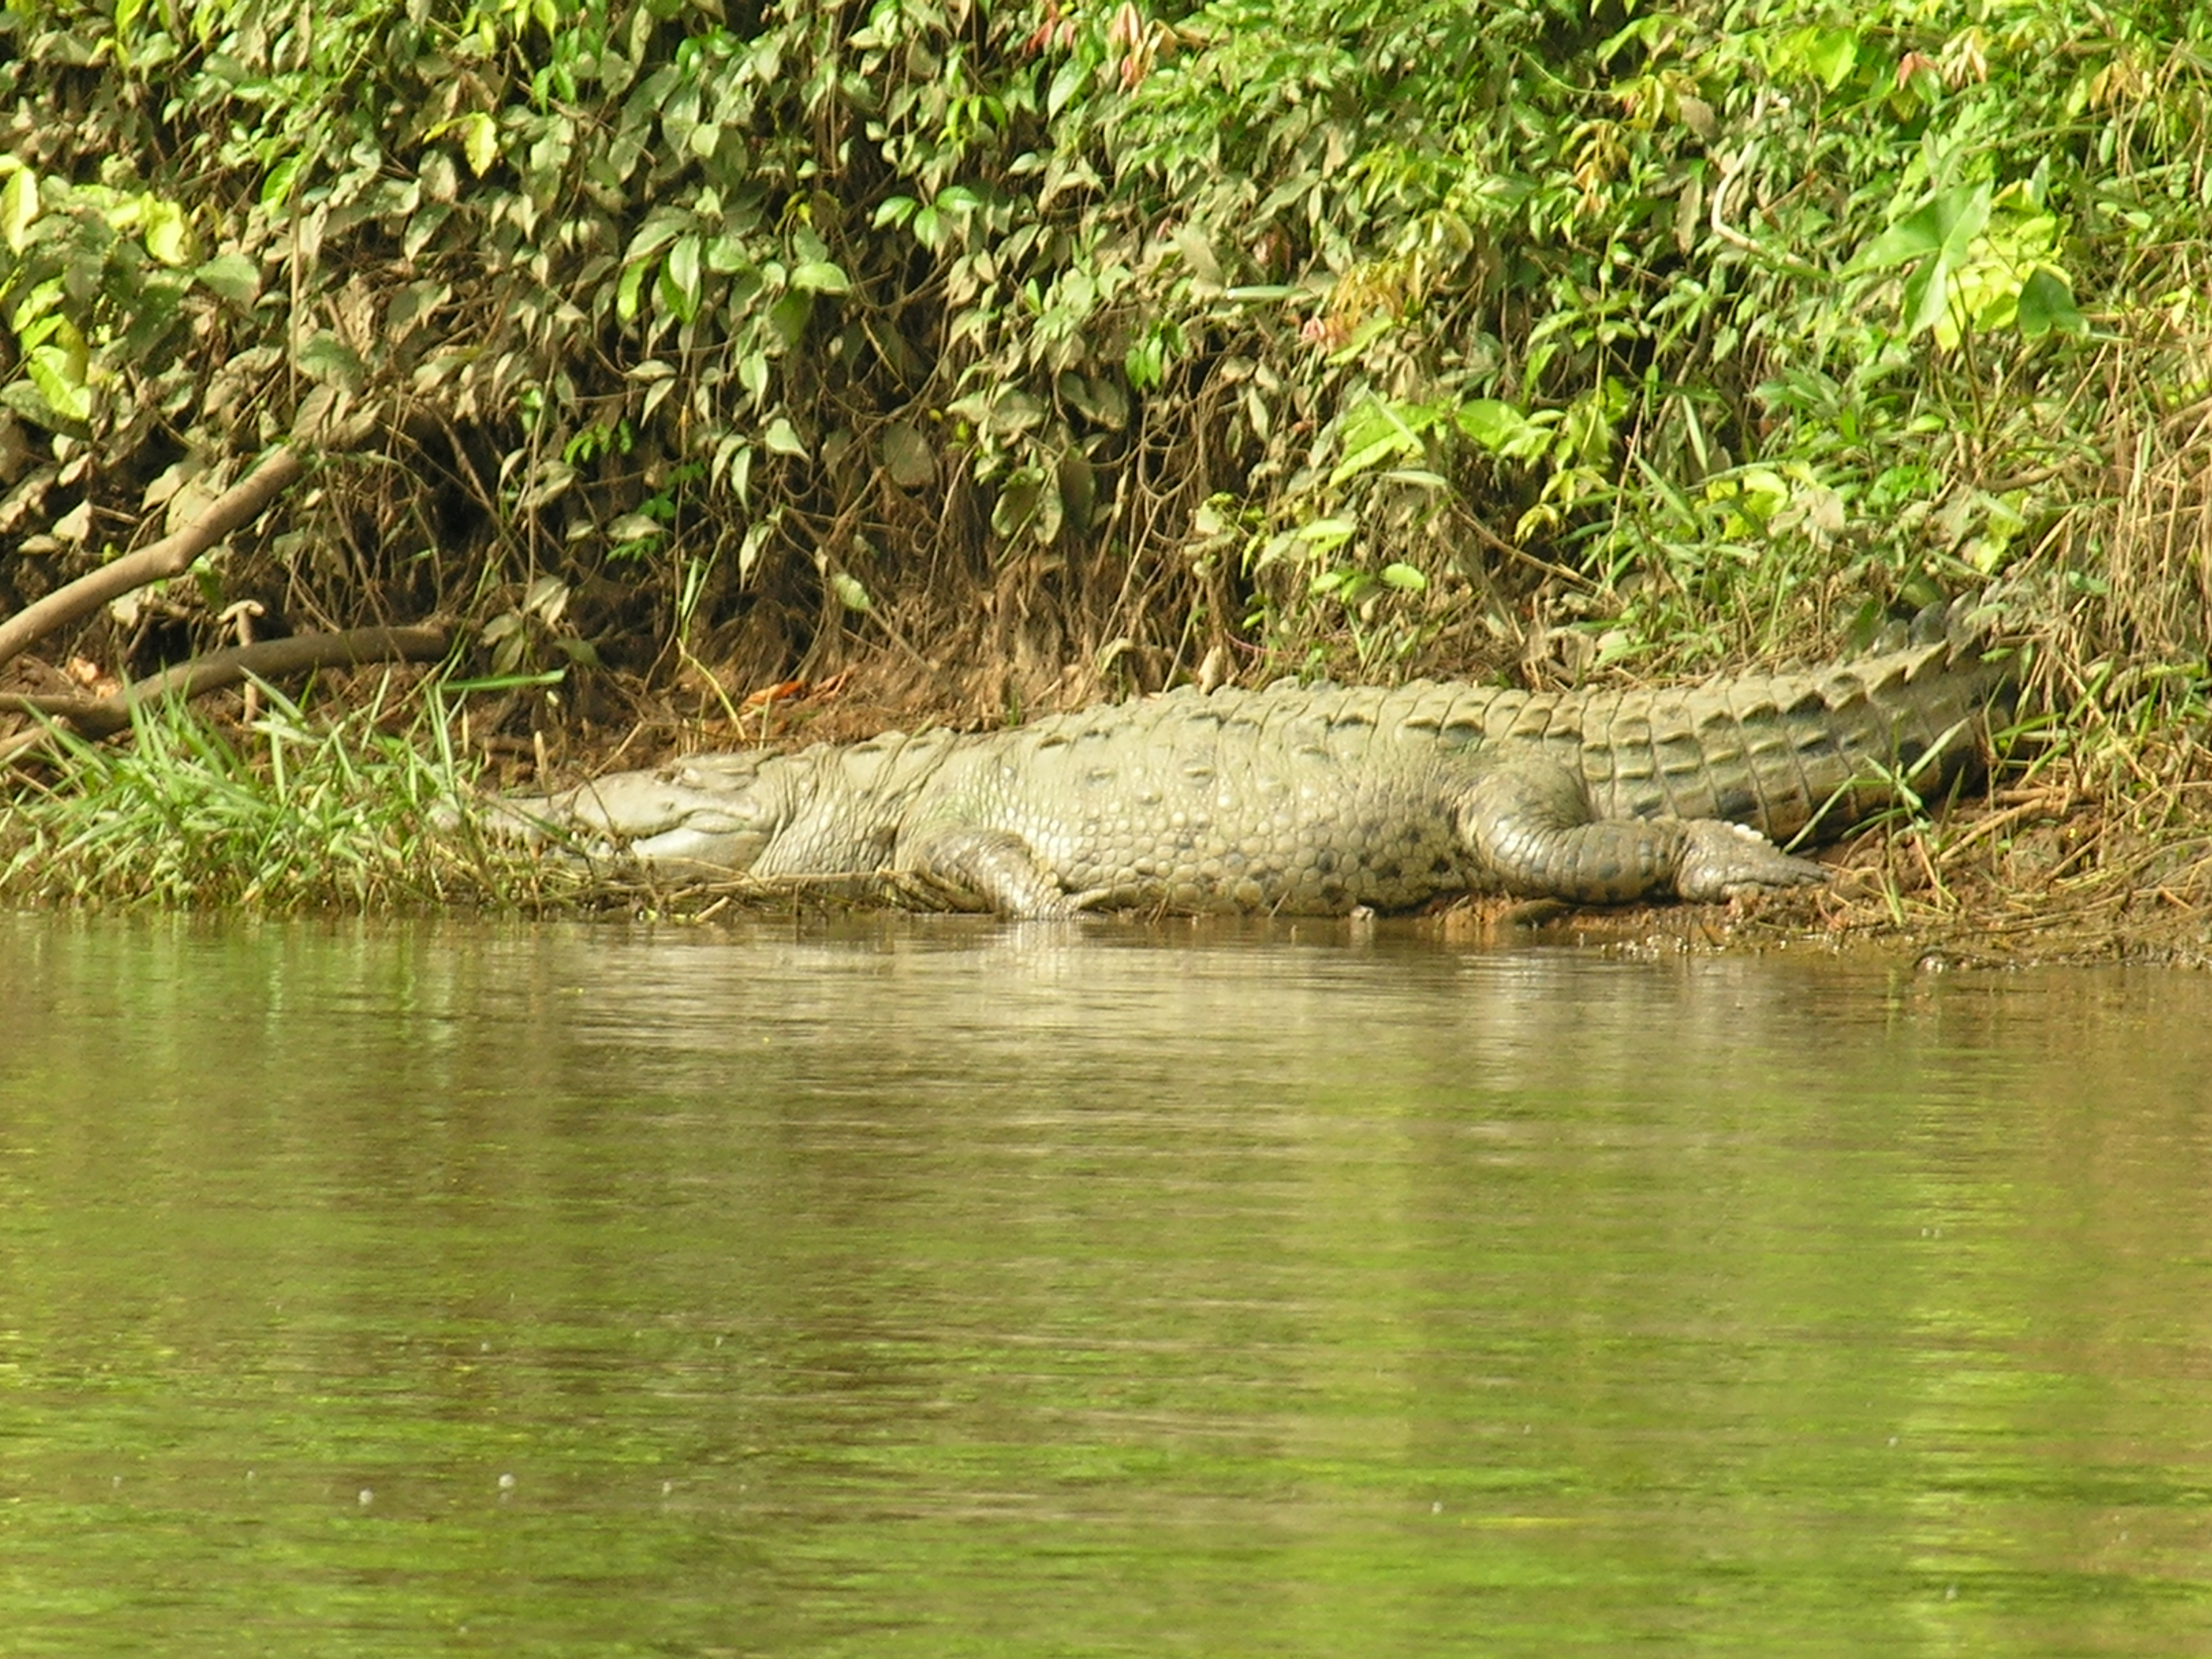 Crocodile seen in Nicaragua